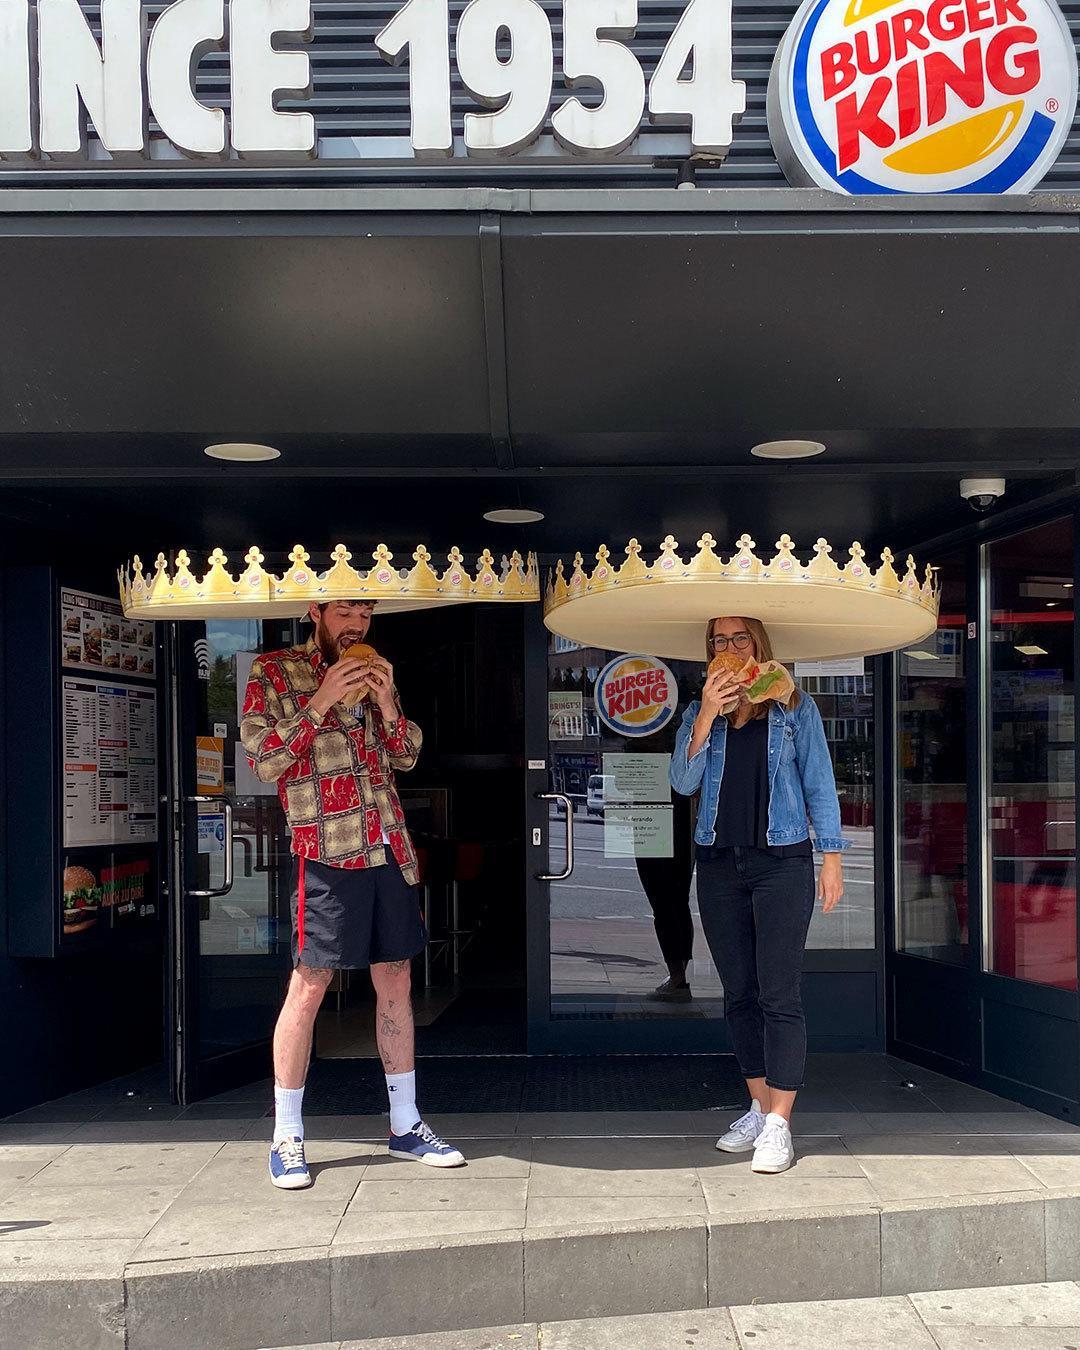 socialdistancingcrown_burger_king